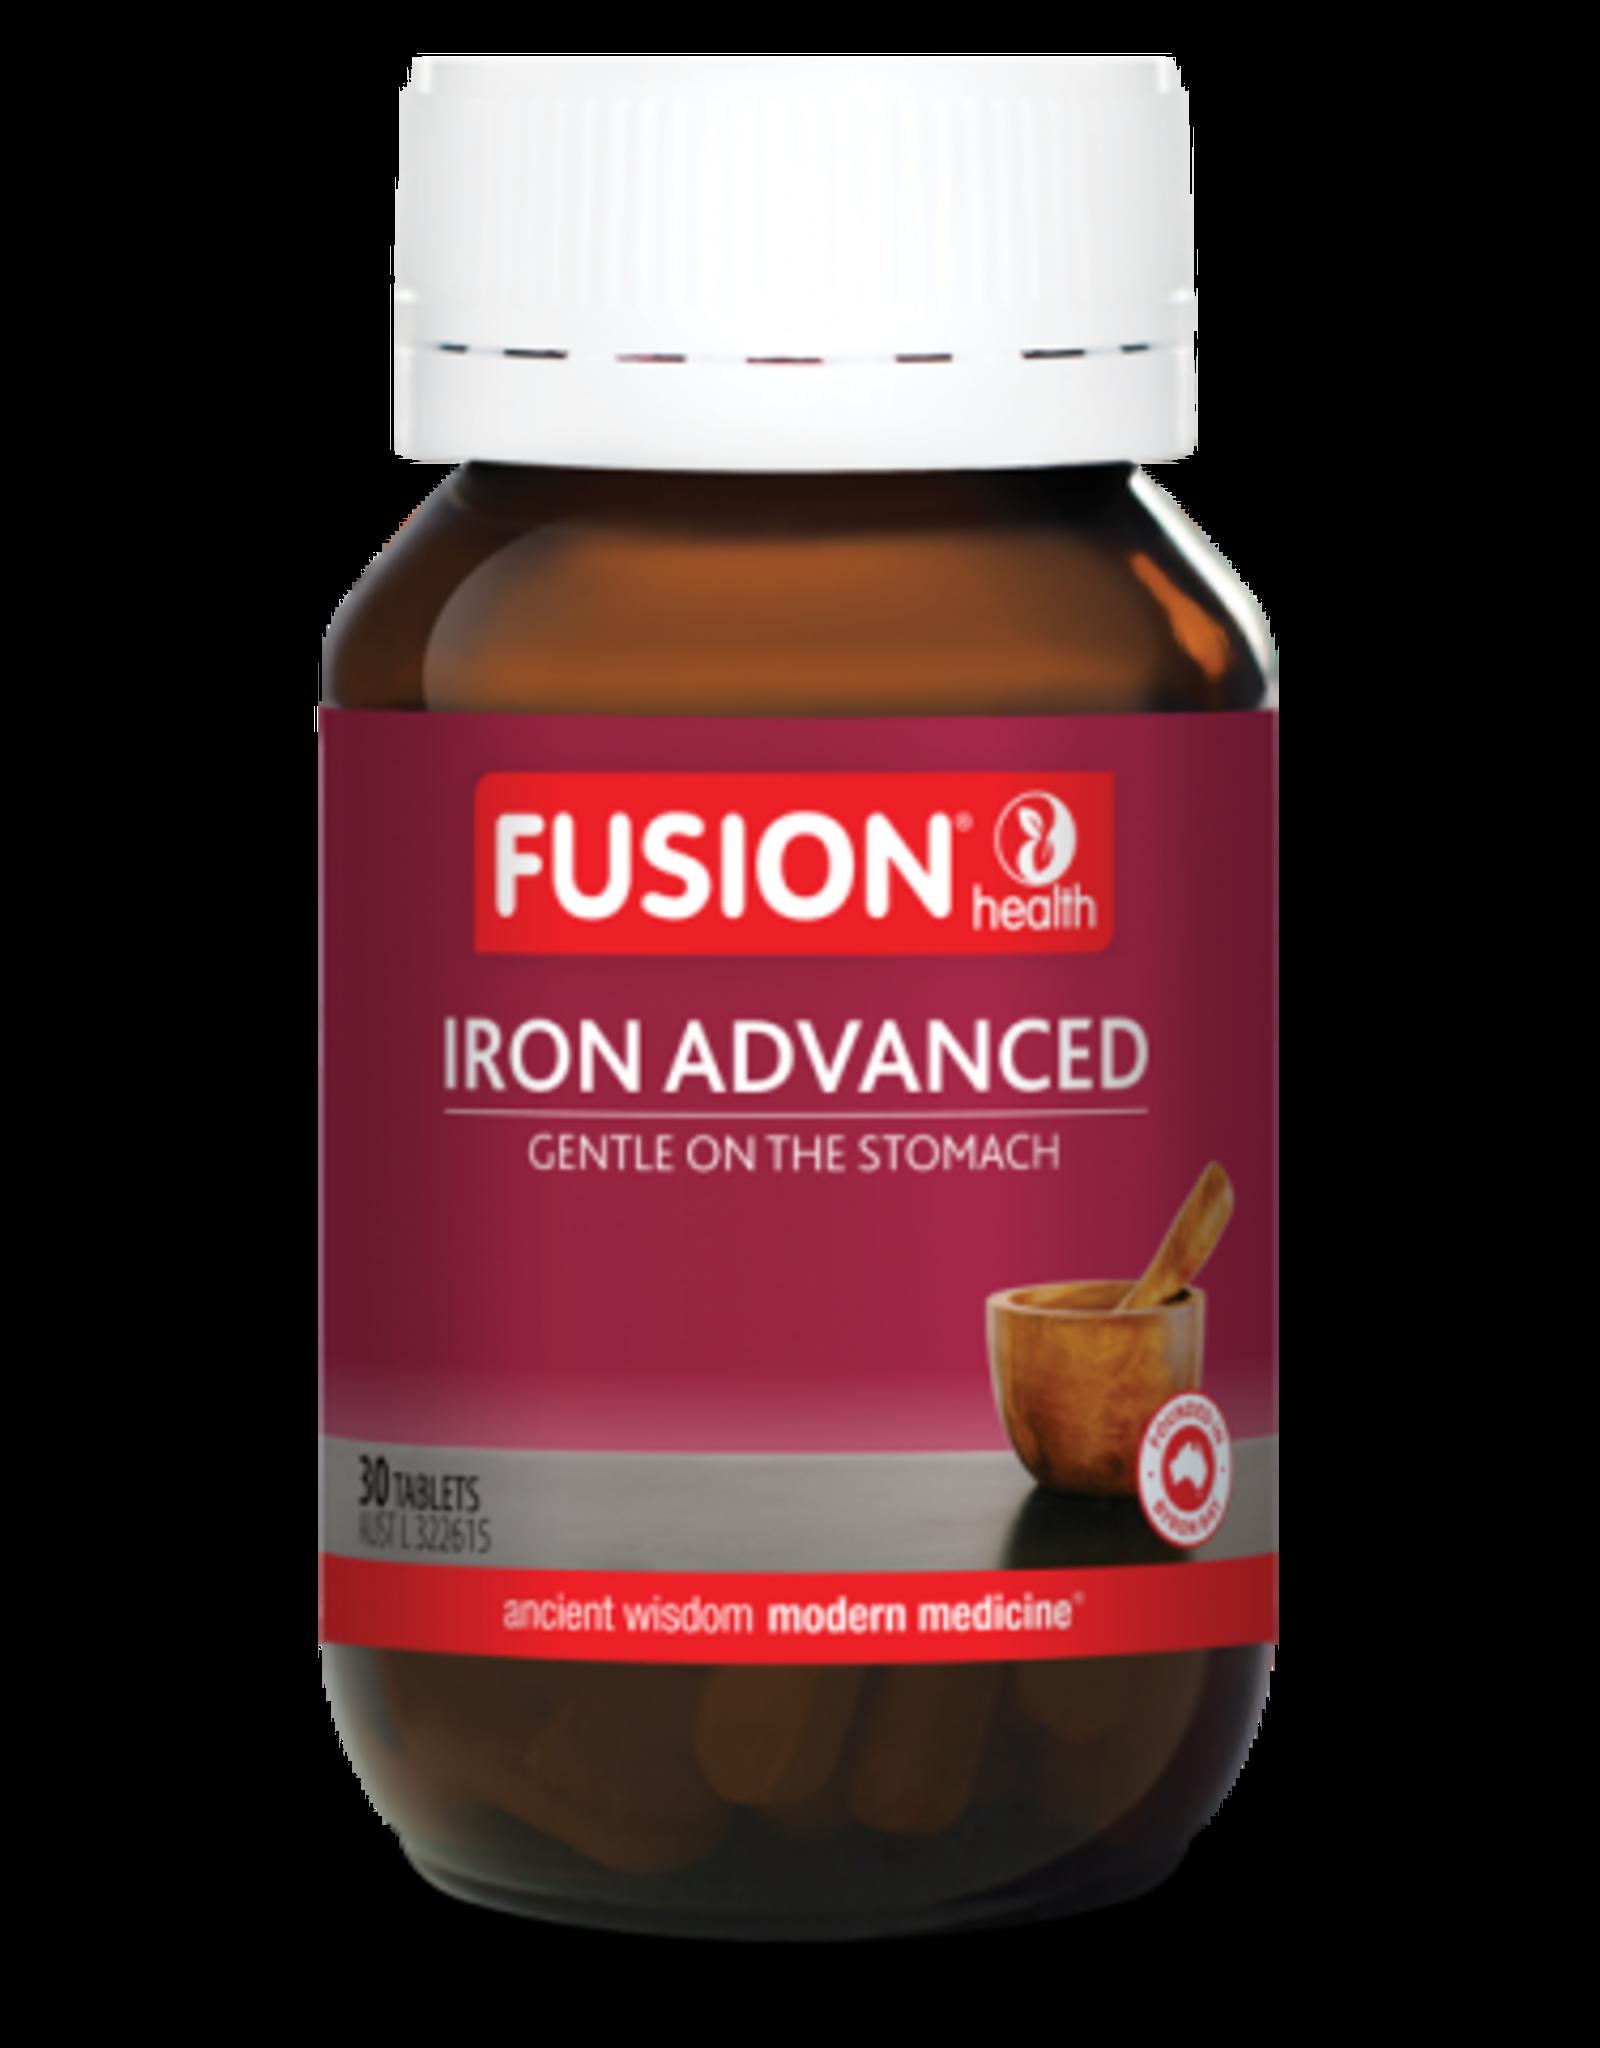 Fusion Iron Advanced